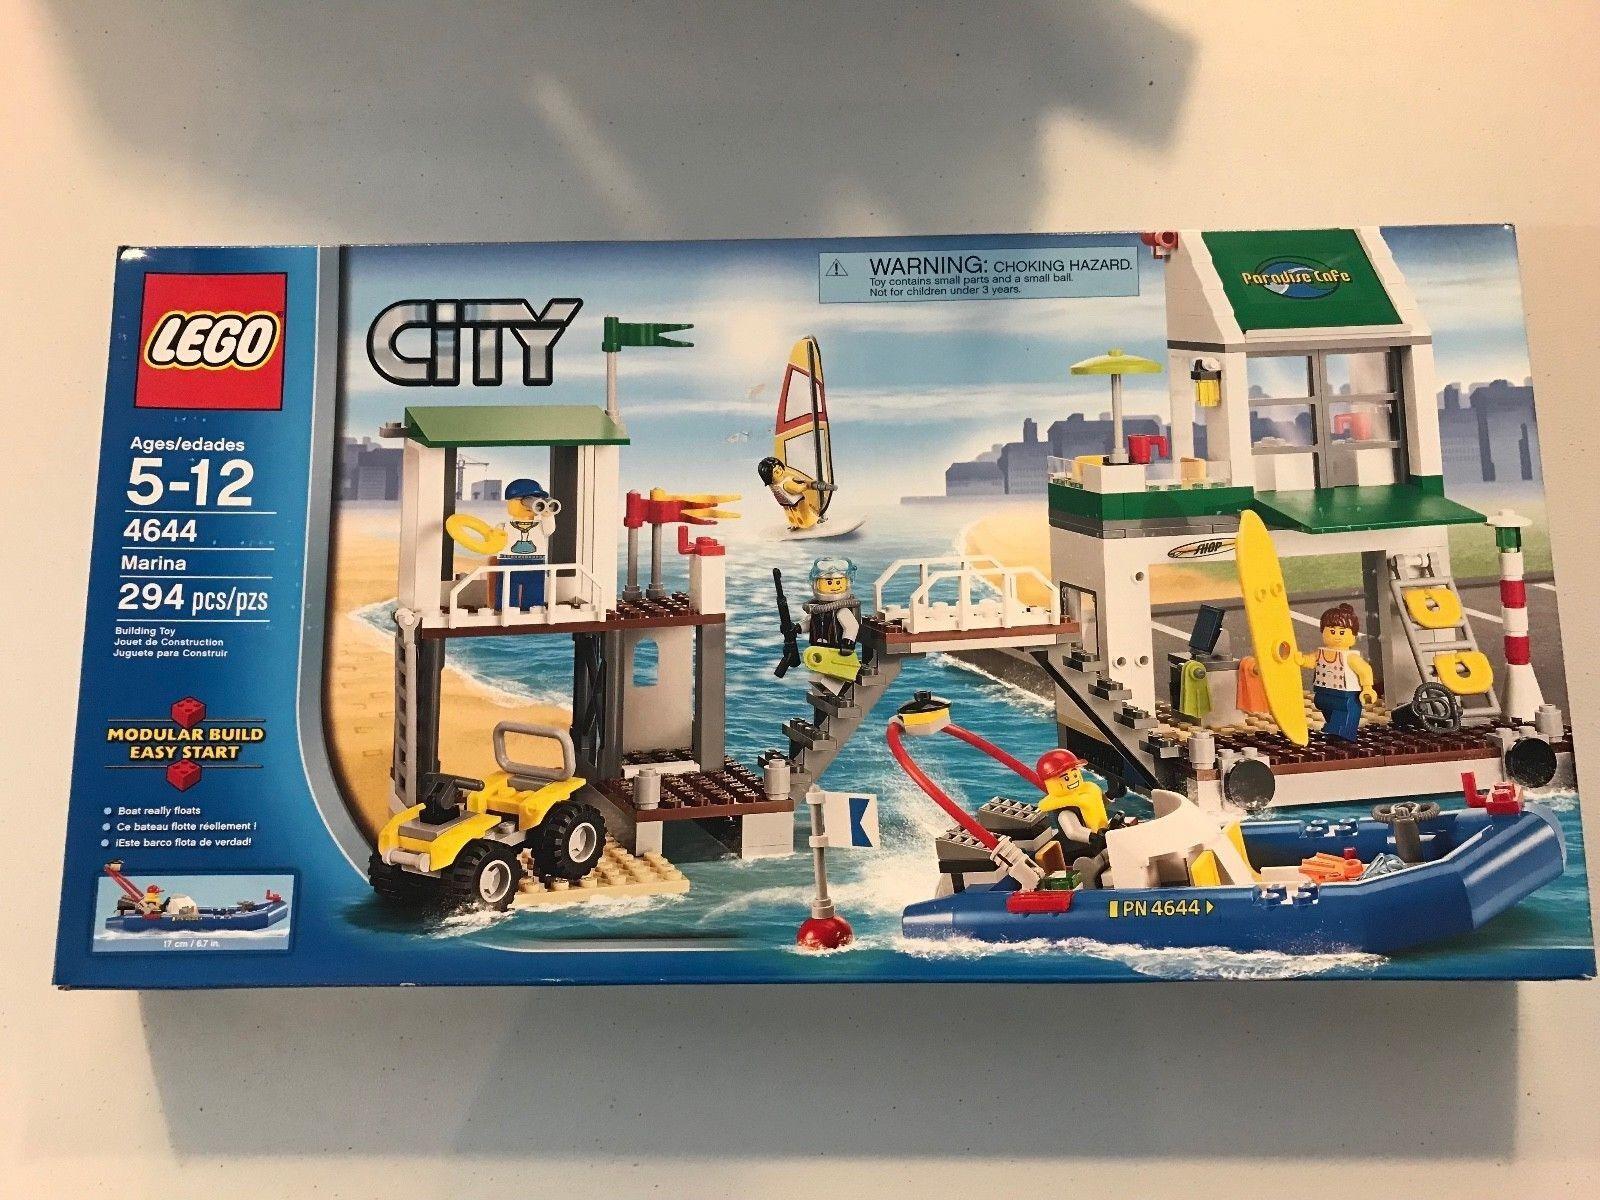 Lego 4644 Marina Brand New Factory Sealed 294 pieces Modular Boat Really Floats